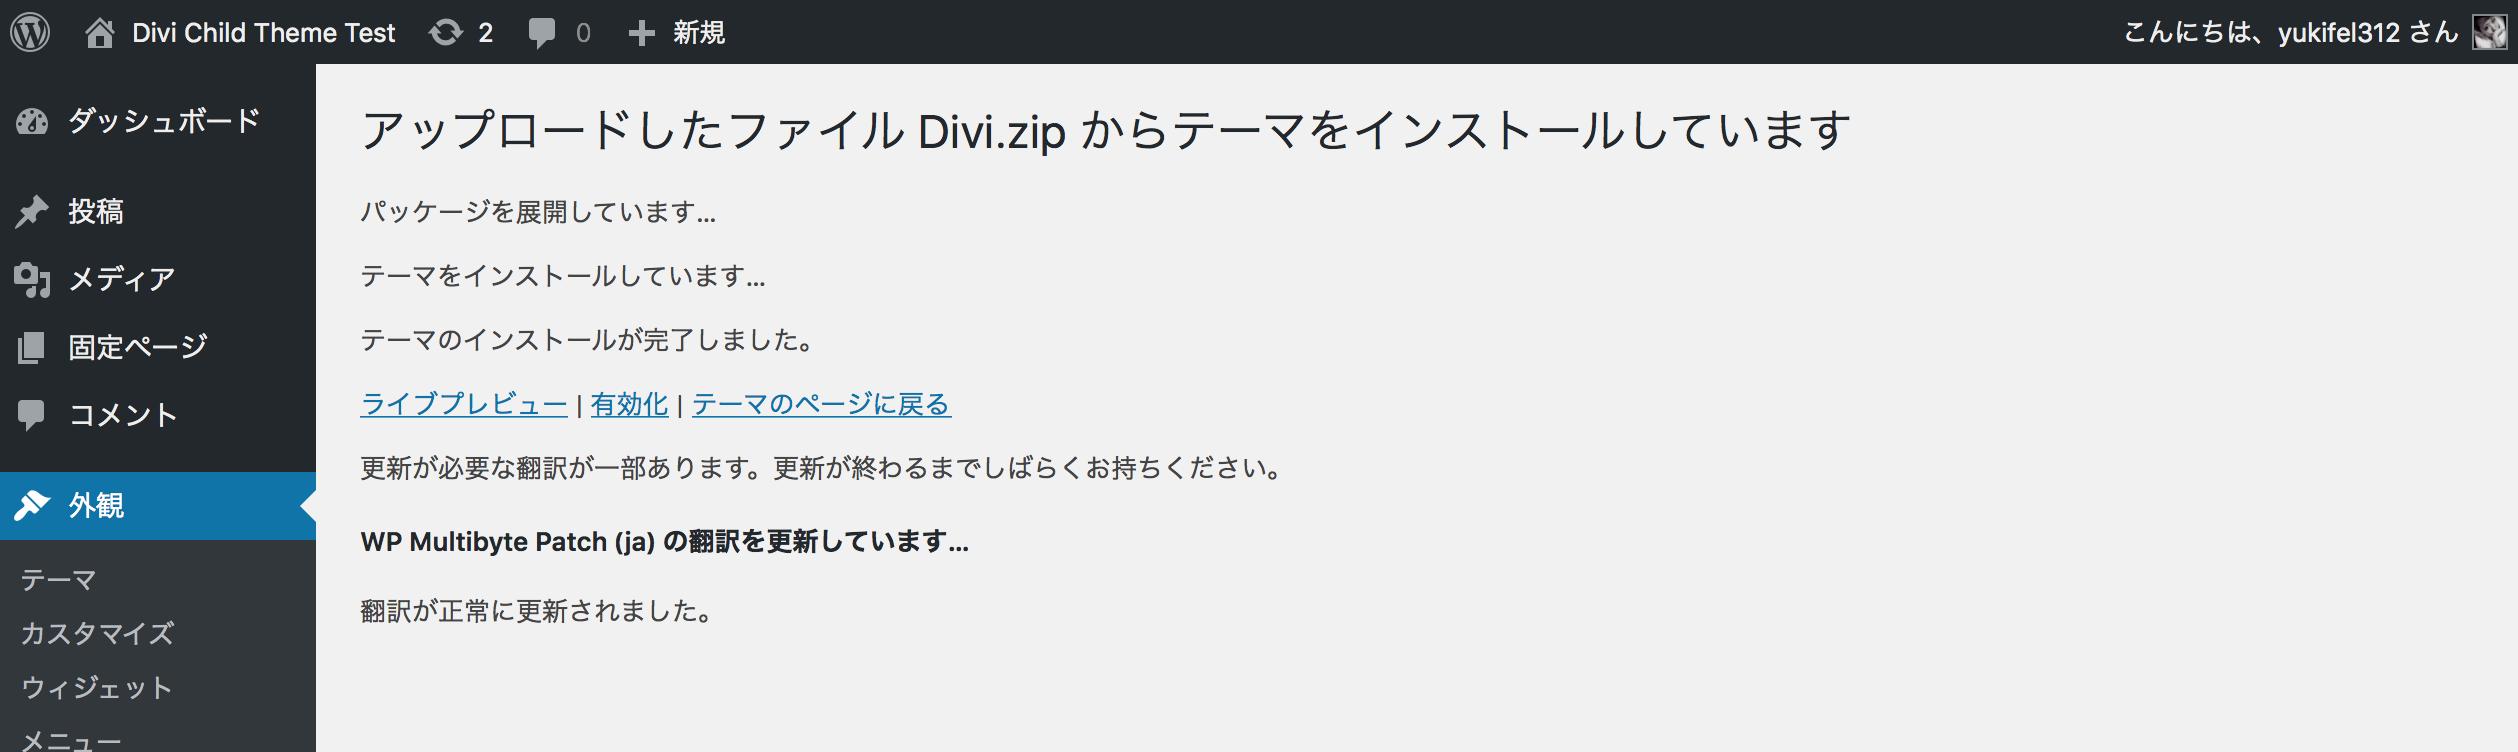 divi child theme demo screenshot